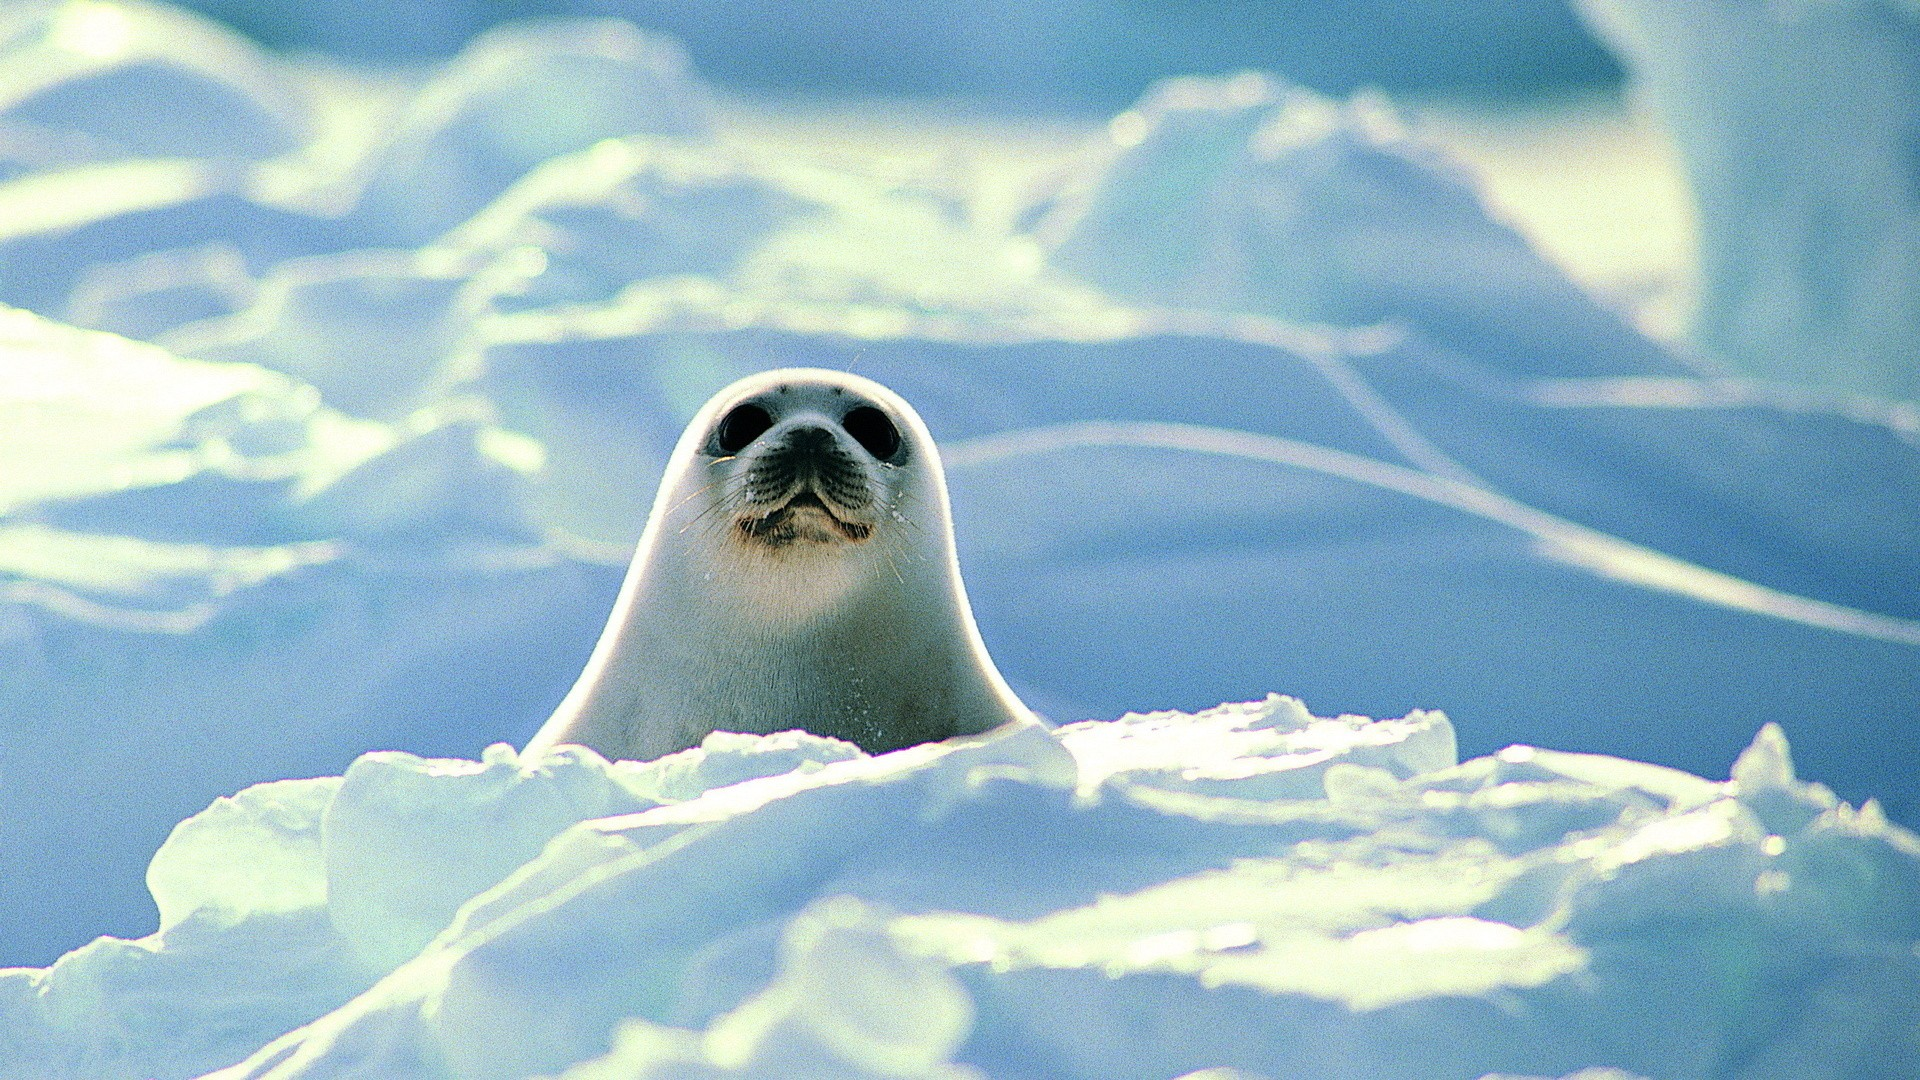 Seal Wallpaper Image